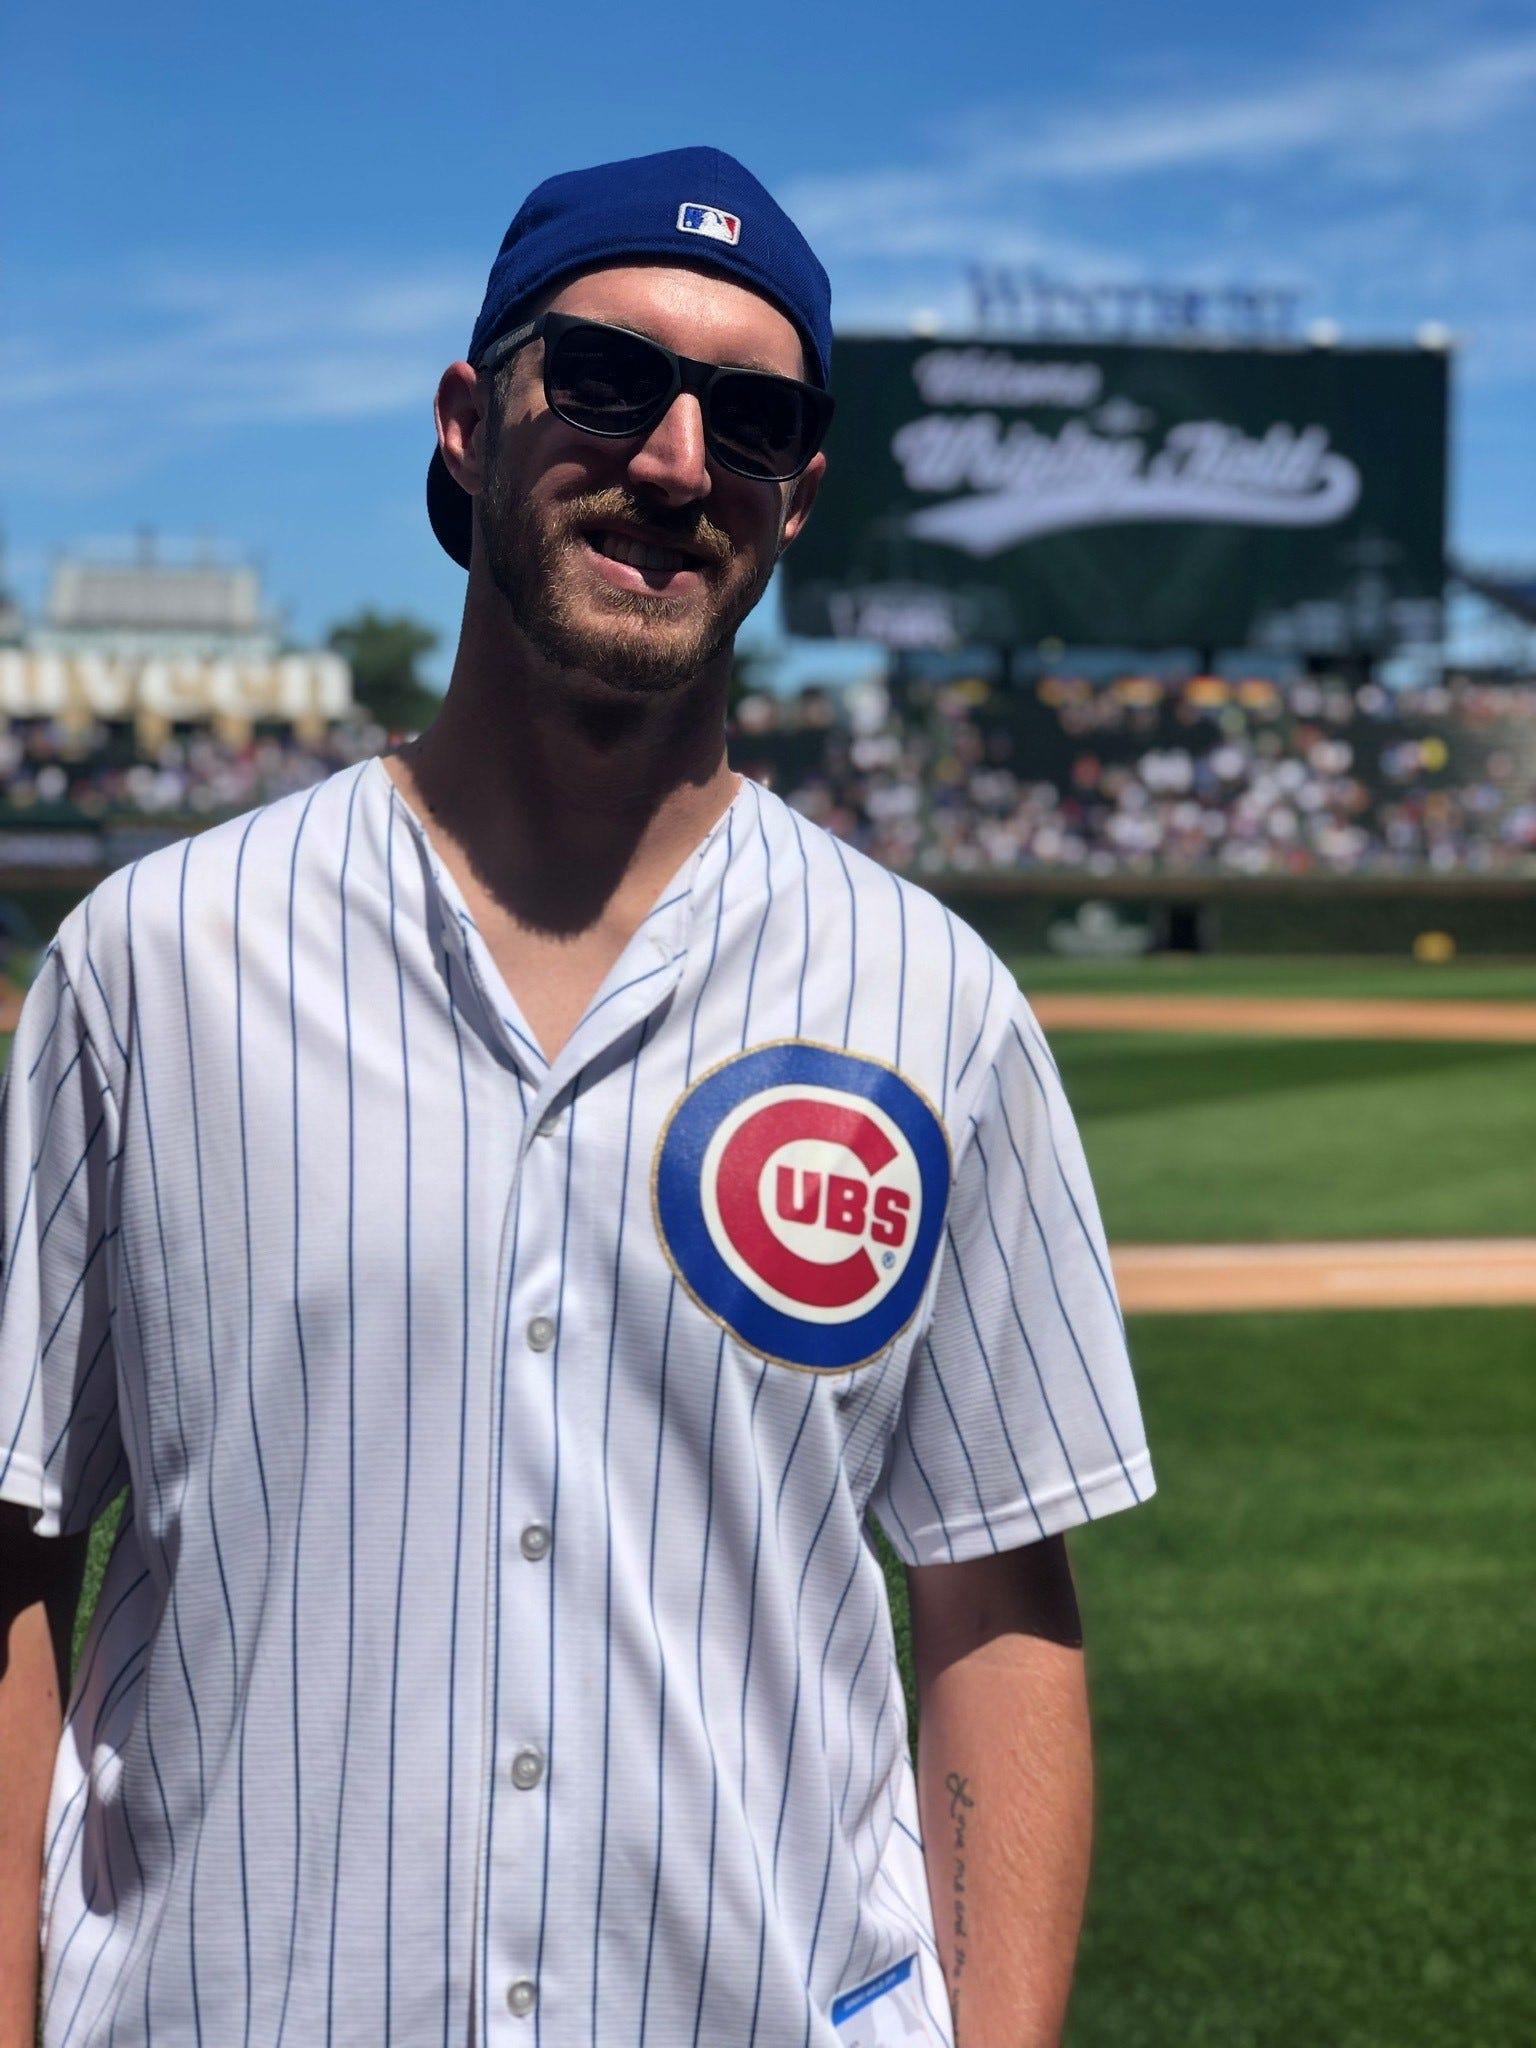 Writer Jake Meisener at a ballpark